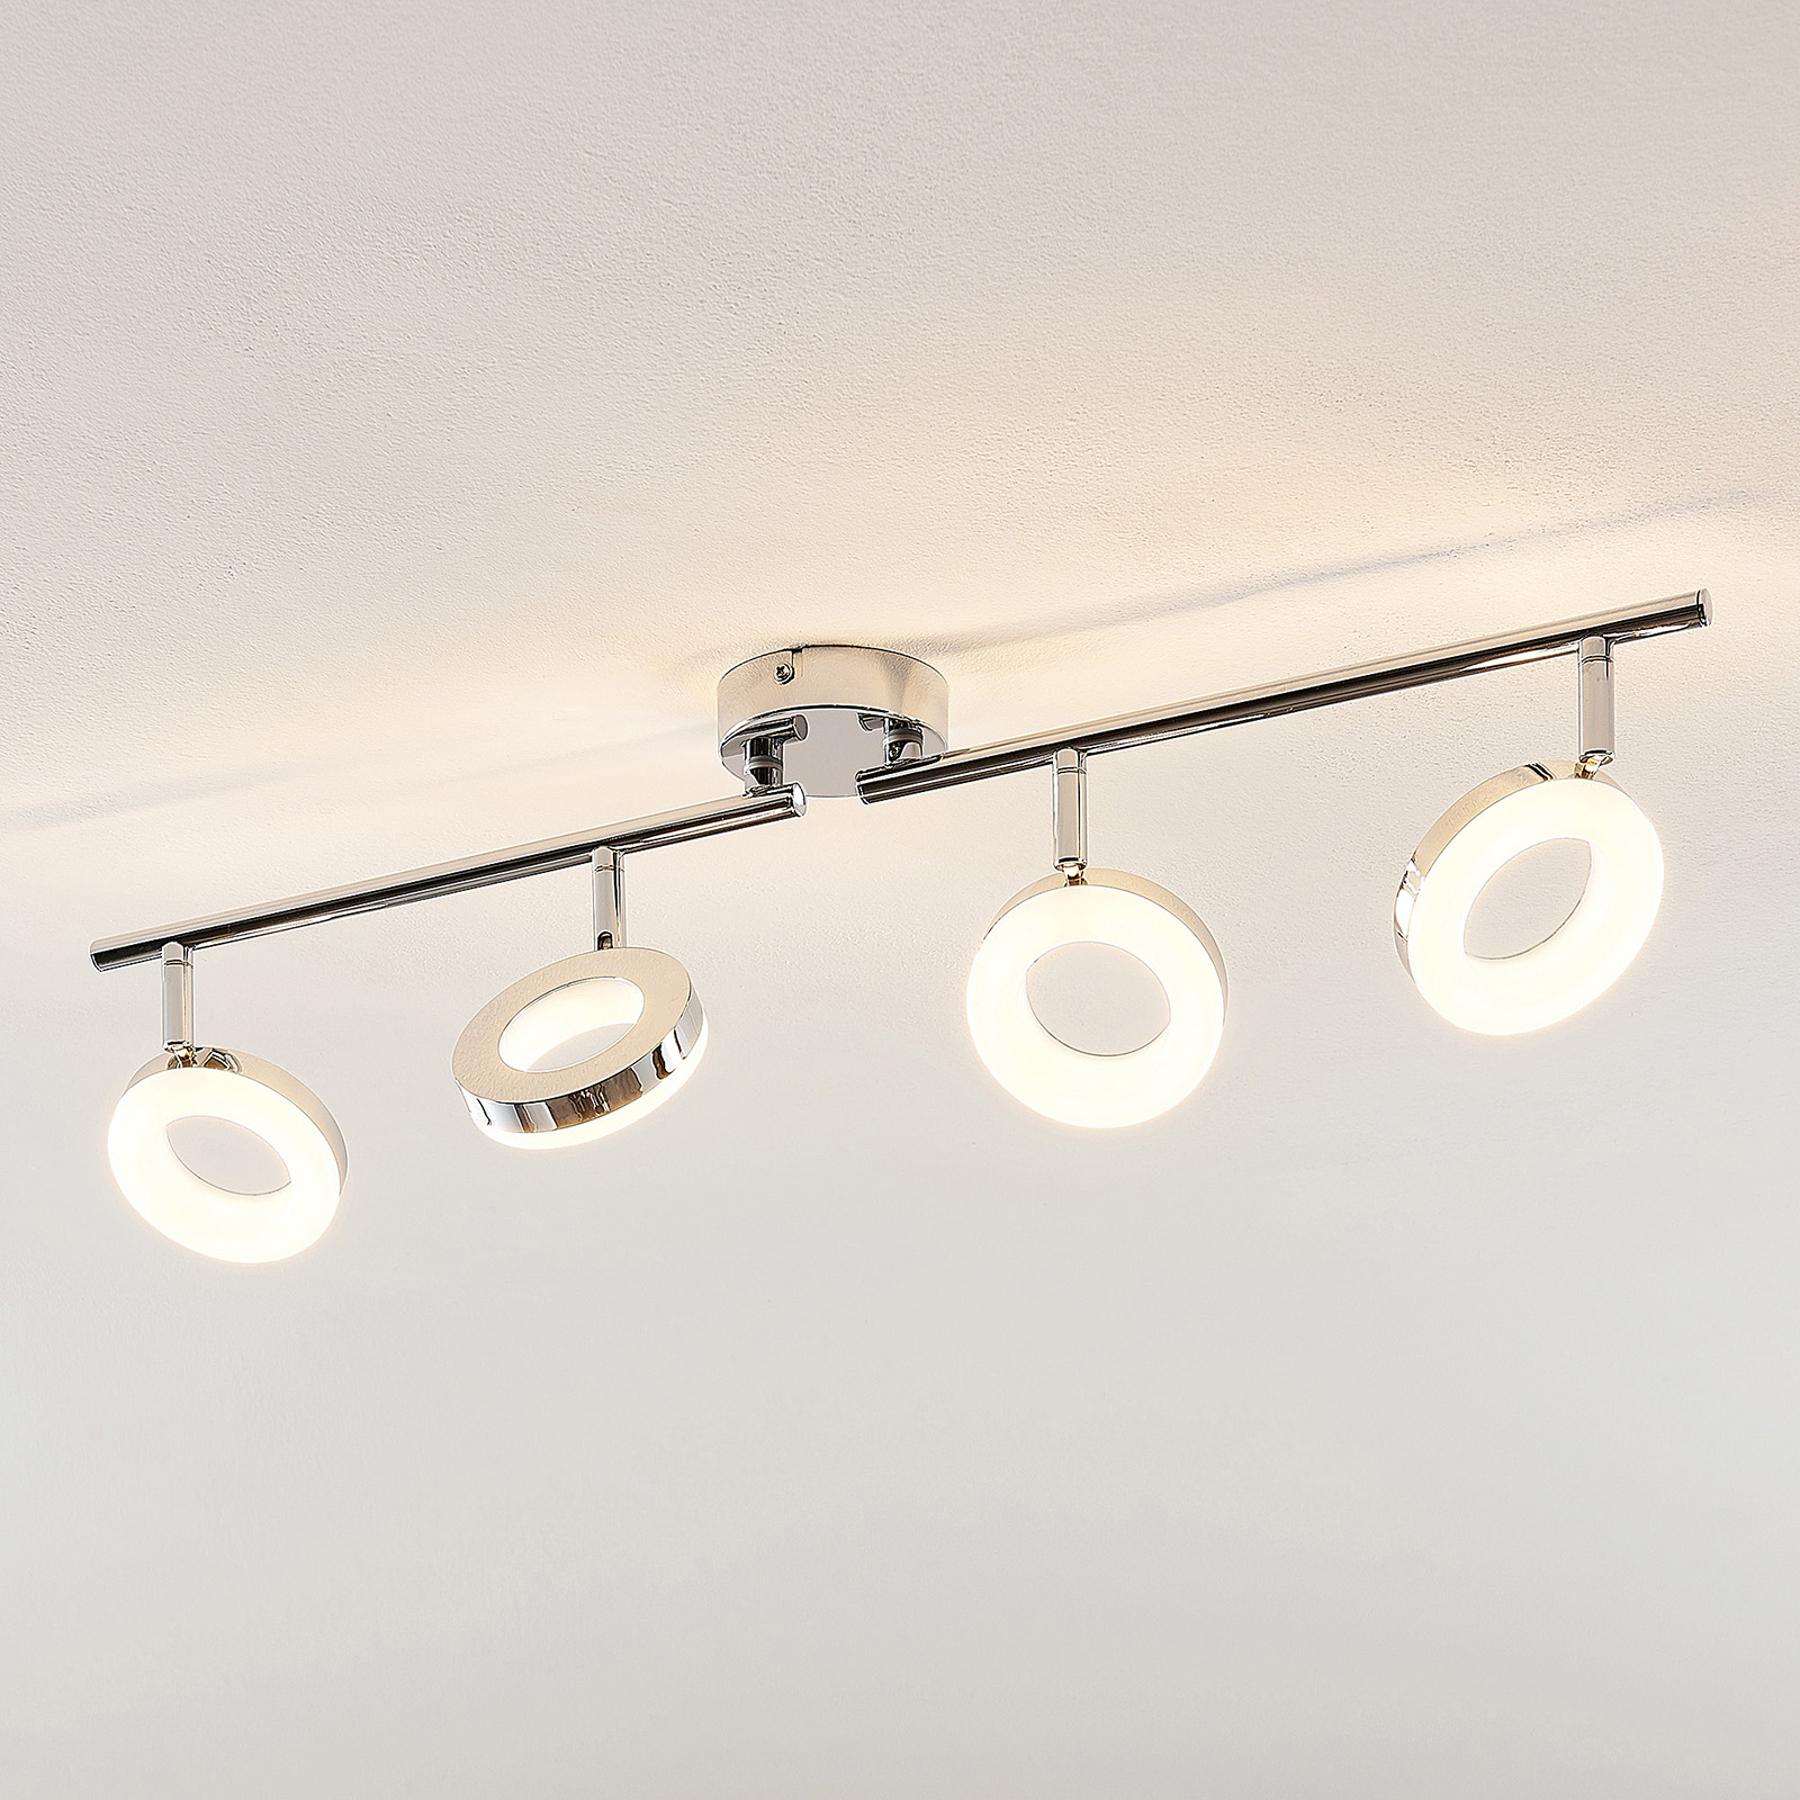 ELC Tioklia LED plafondlamp, chroom, 4-lamps